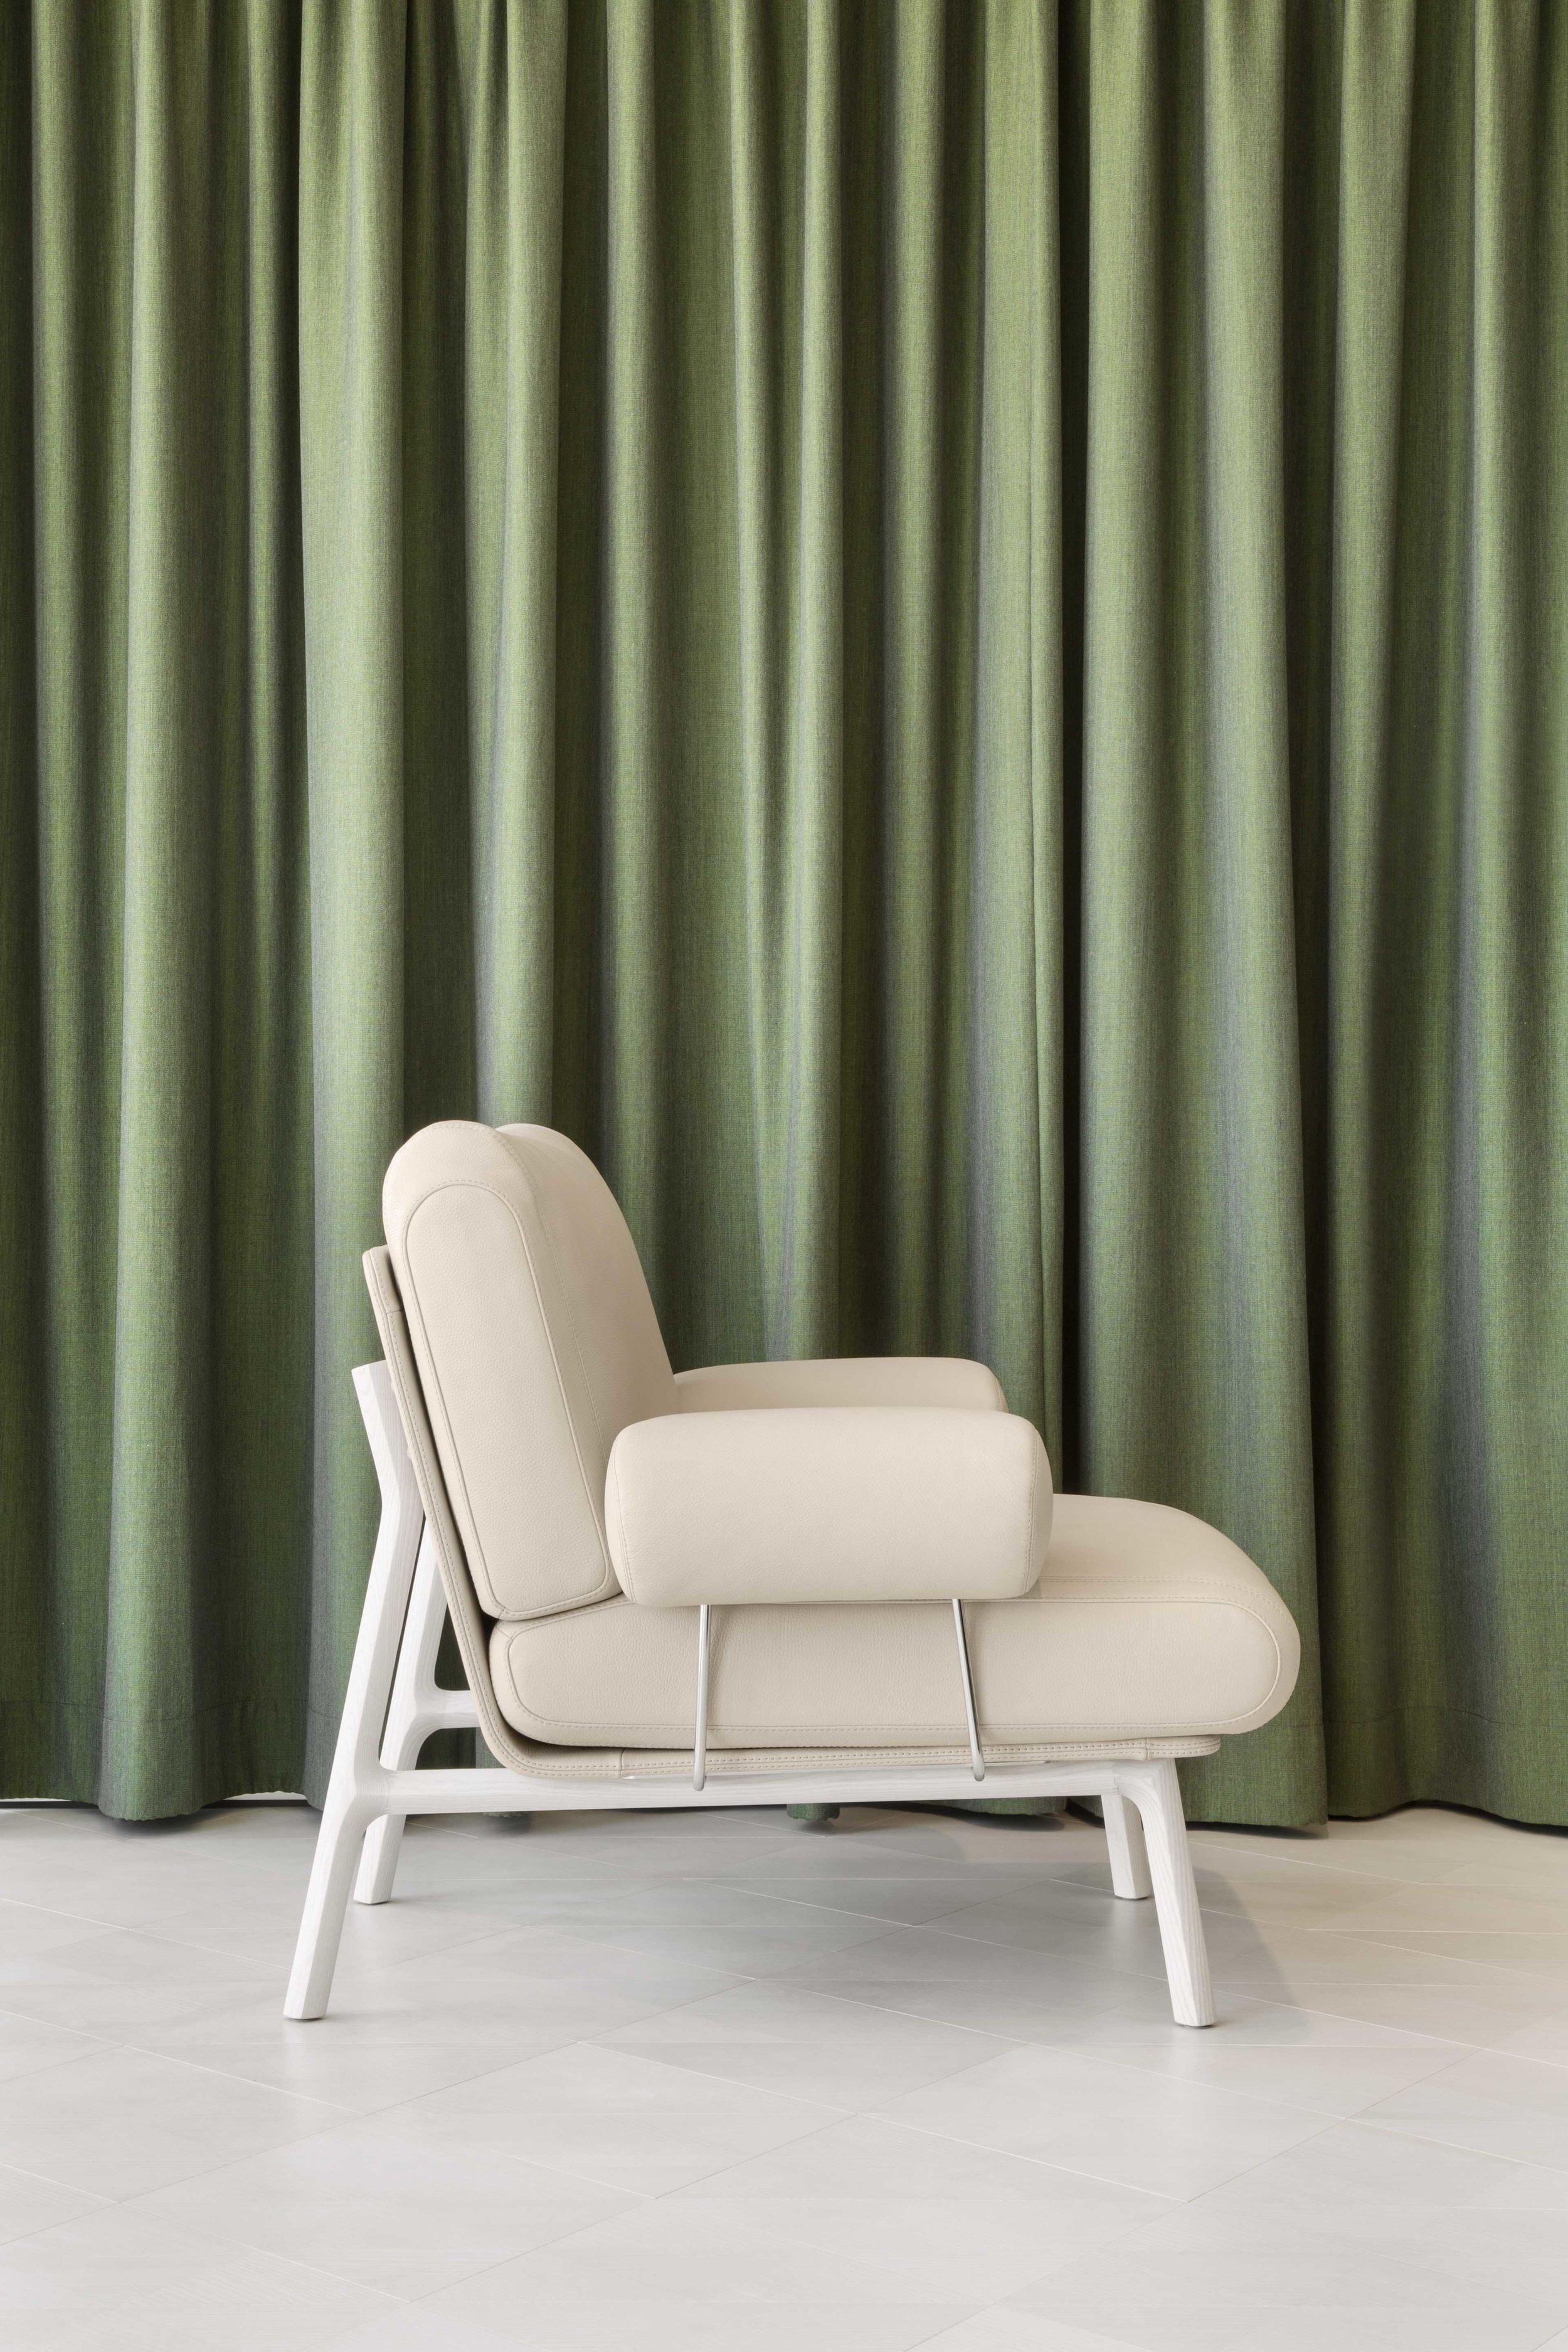 medeo-armchair_furniture-design_coordination-berlin_03.jpg